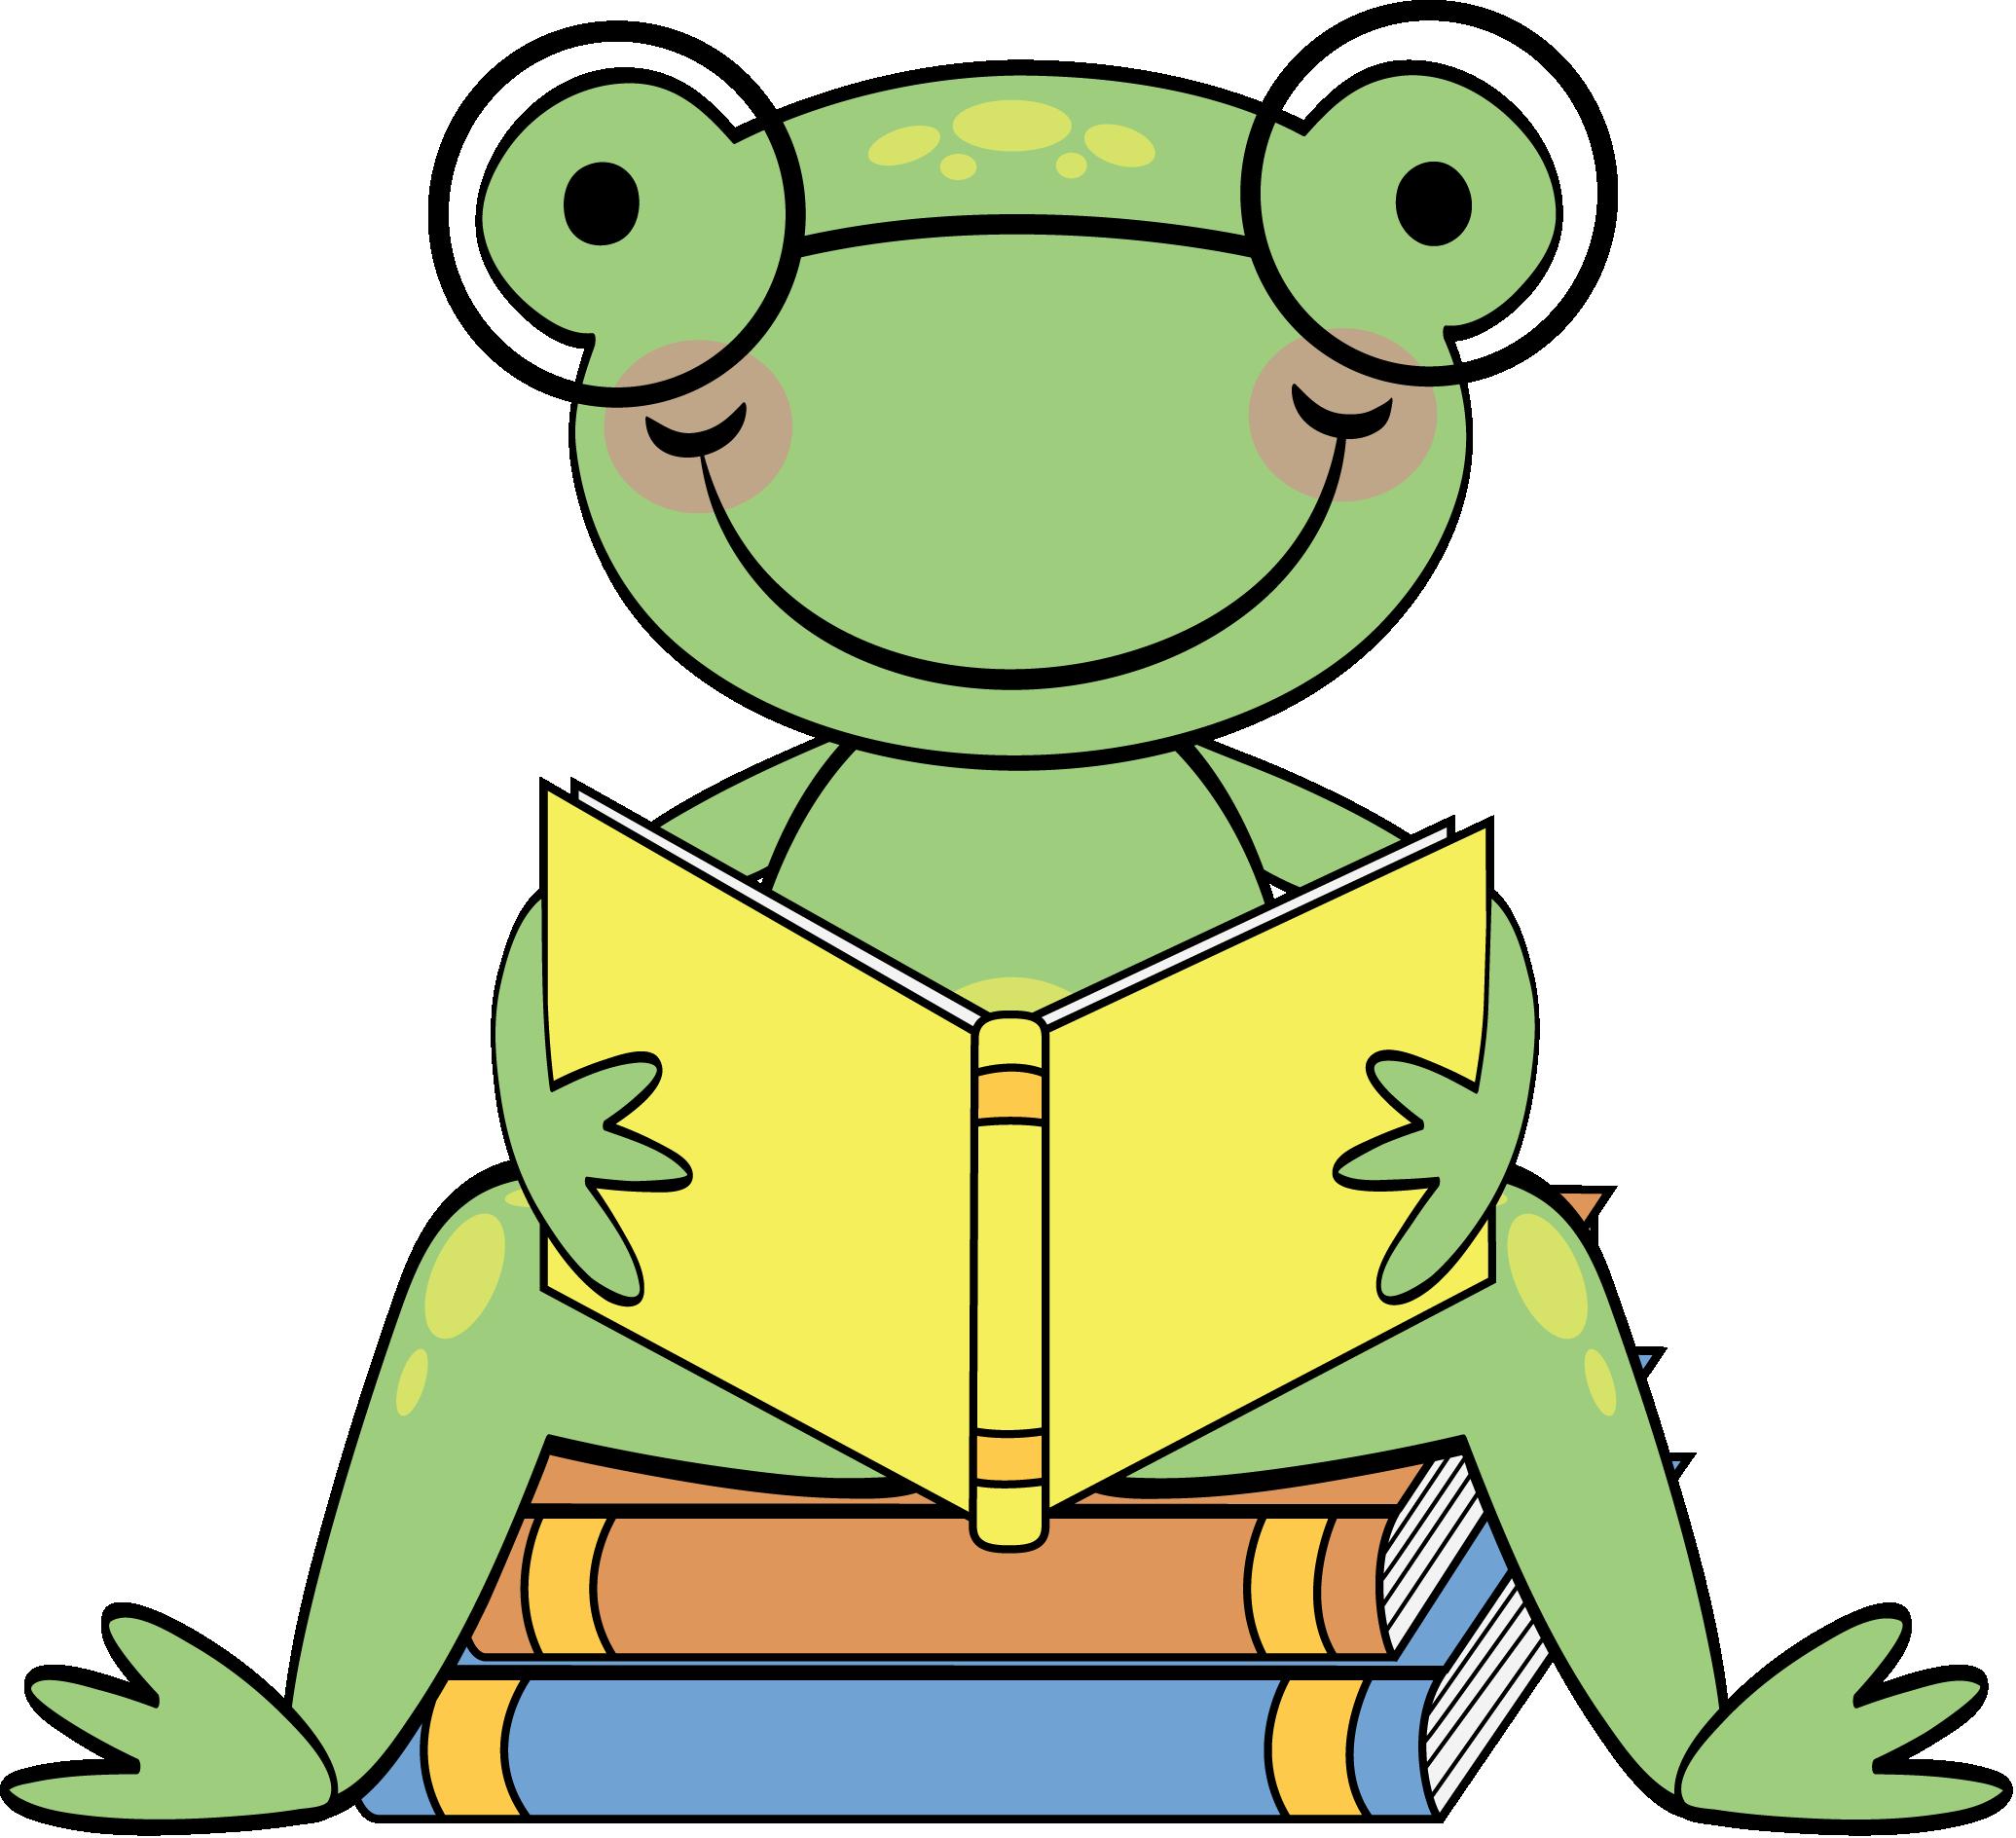 Clipart school frog, Clipart school frog Transparent FREE.